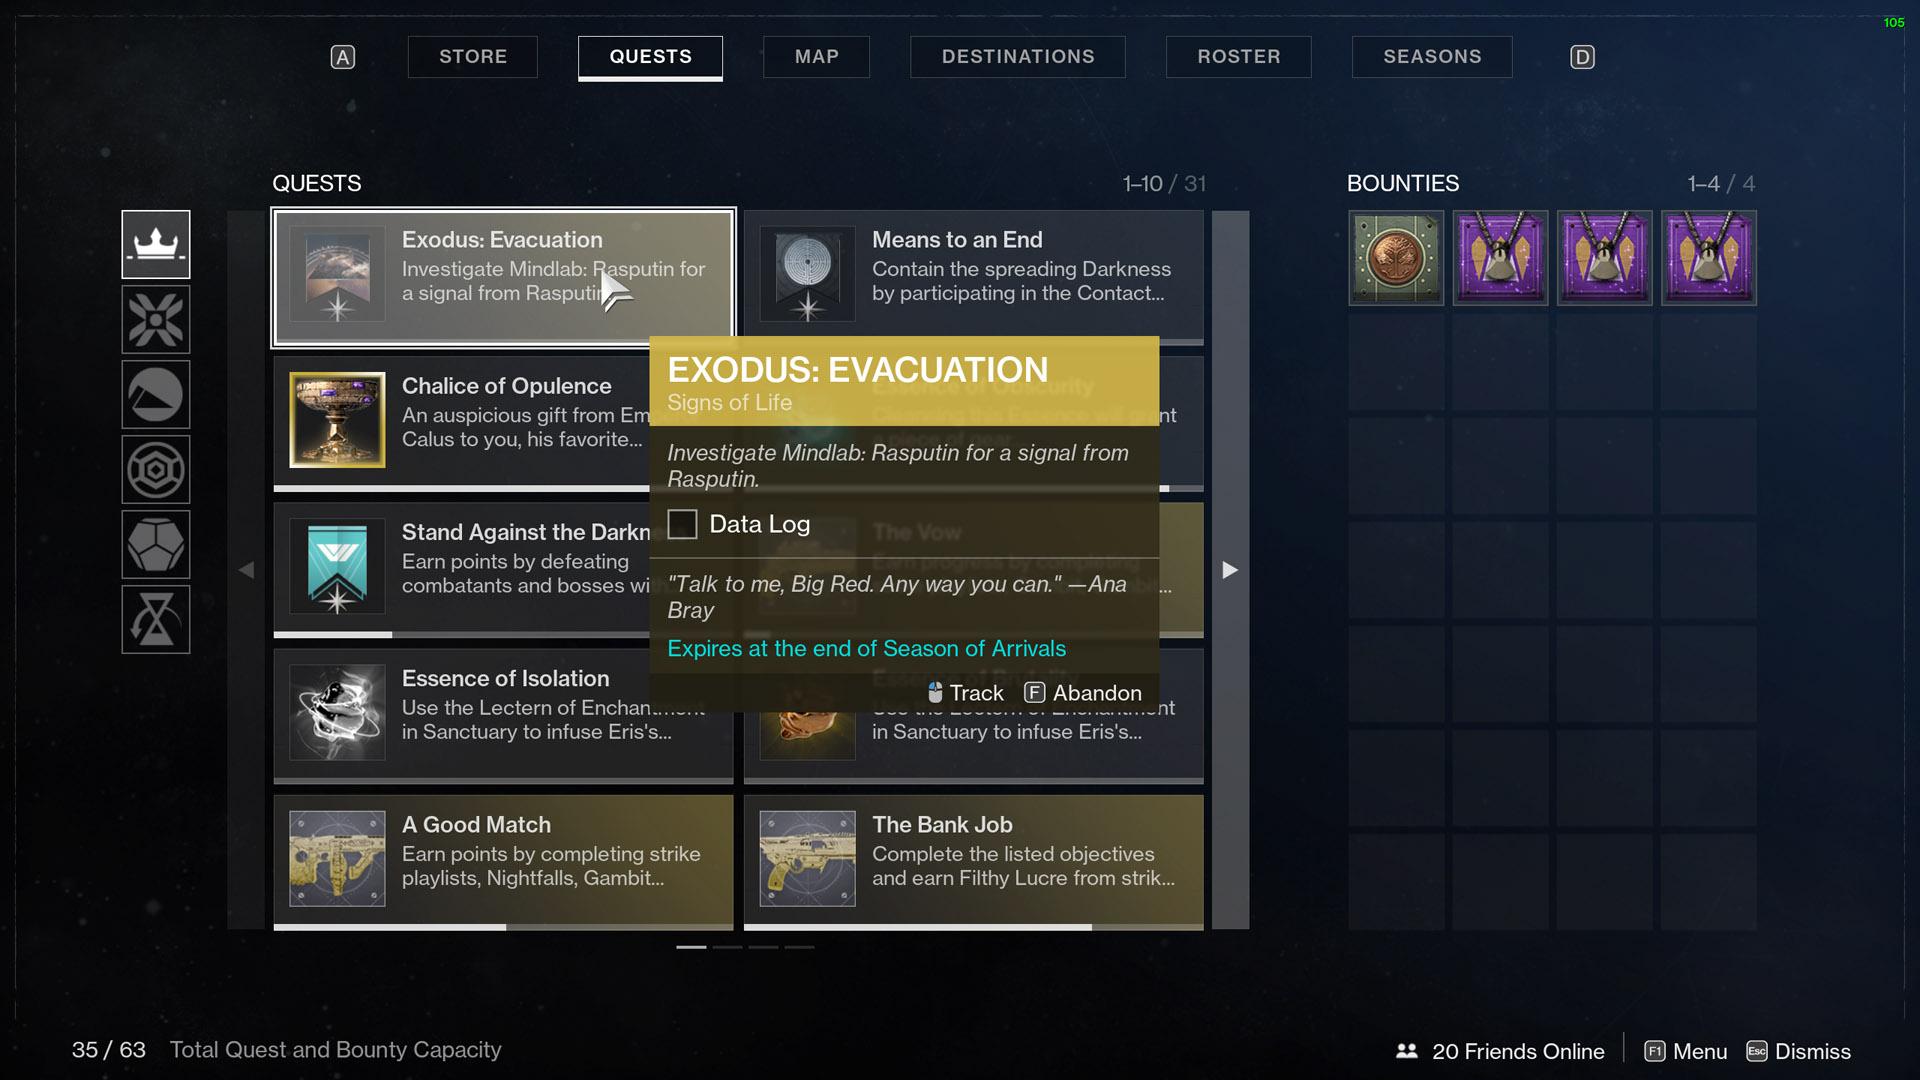 Destiny 2 Exodus Evacuation Signs of Life